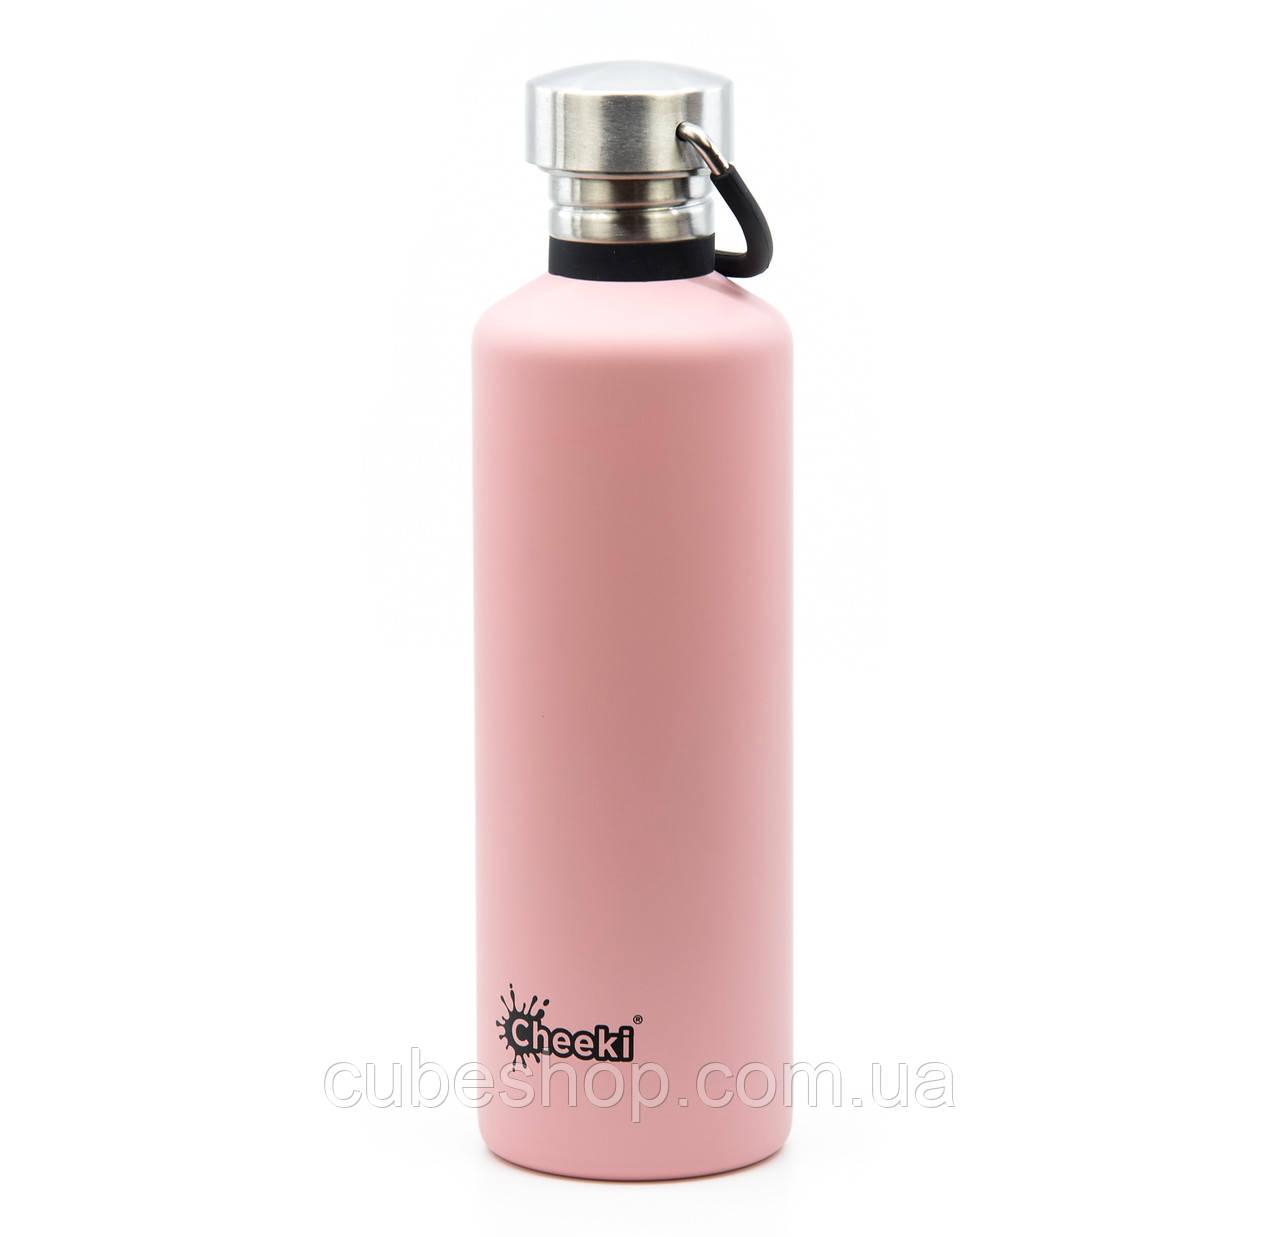 Бутылка для воды Cheeki Classic Single Wall Pink (750 мл)